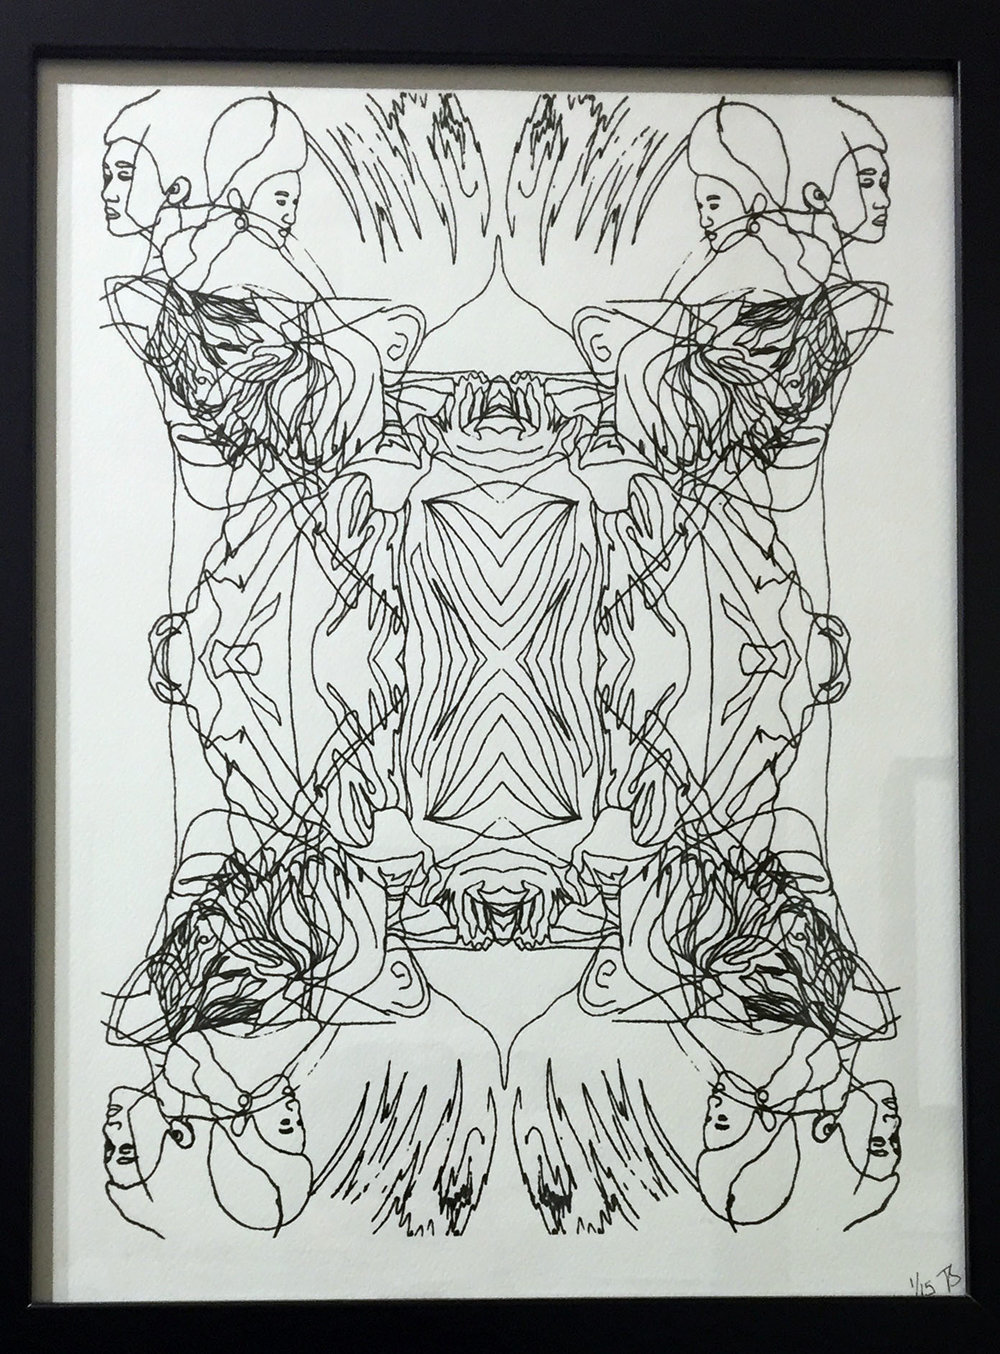 Abstract Asian Screen Print - Framed, £50. Unframed, 15.